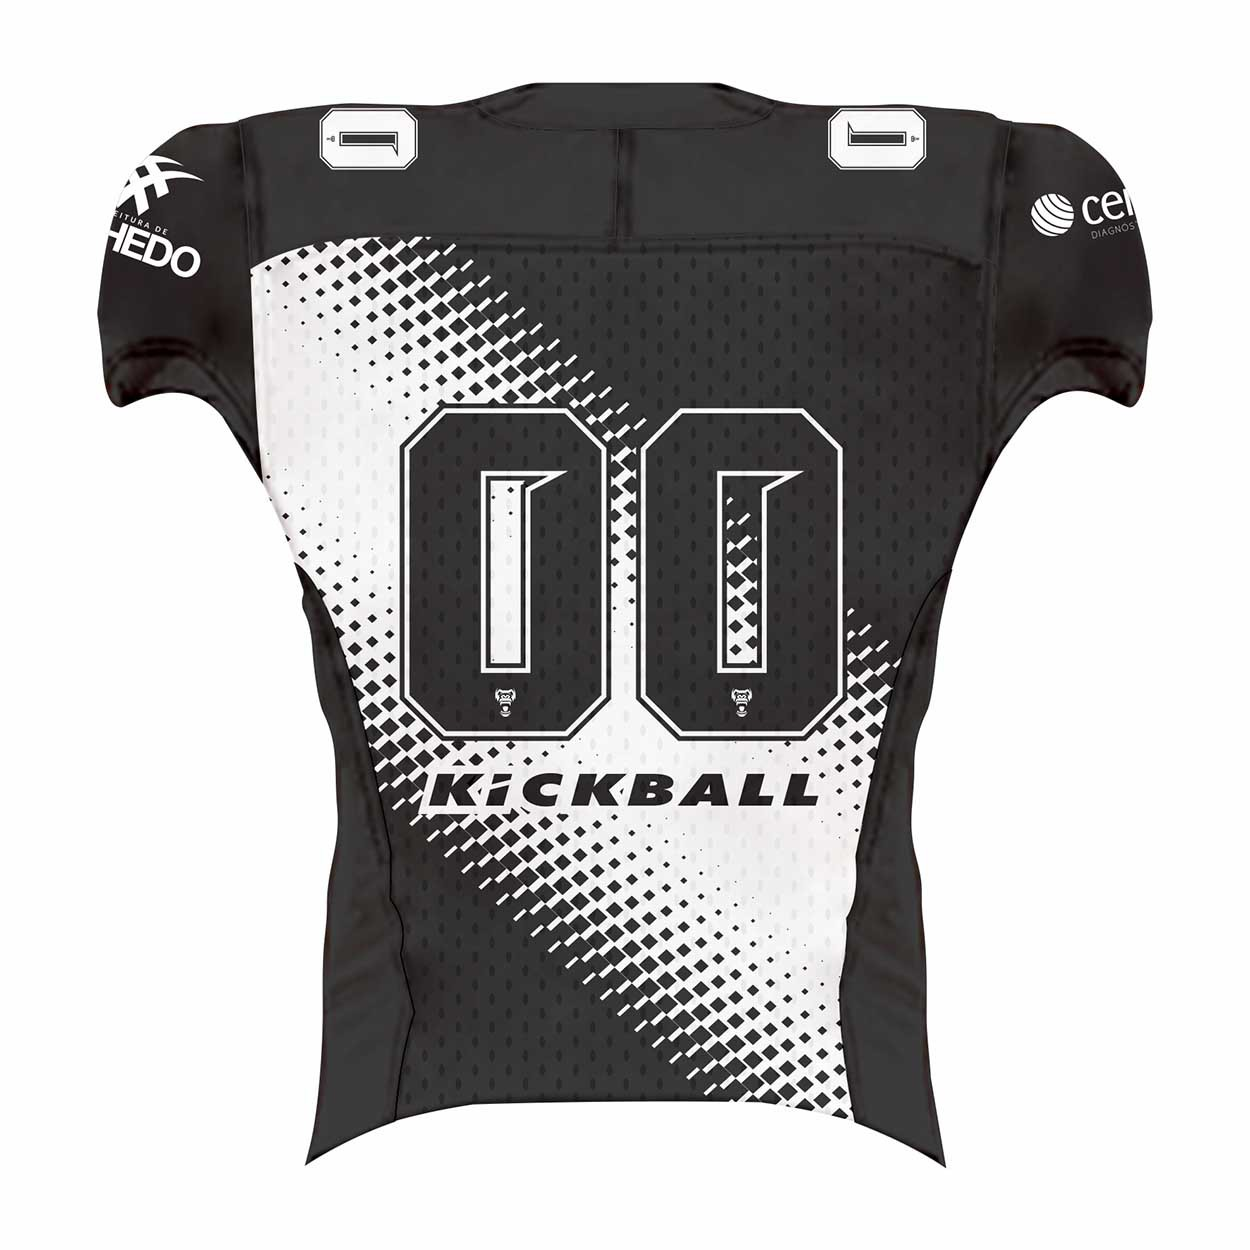 Camisa Of. Ponte Preta Gorilas Jersey Masc. JG2